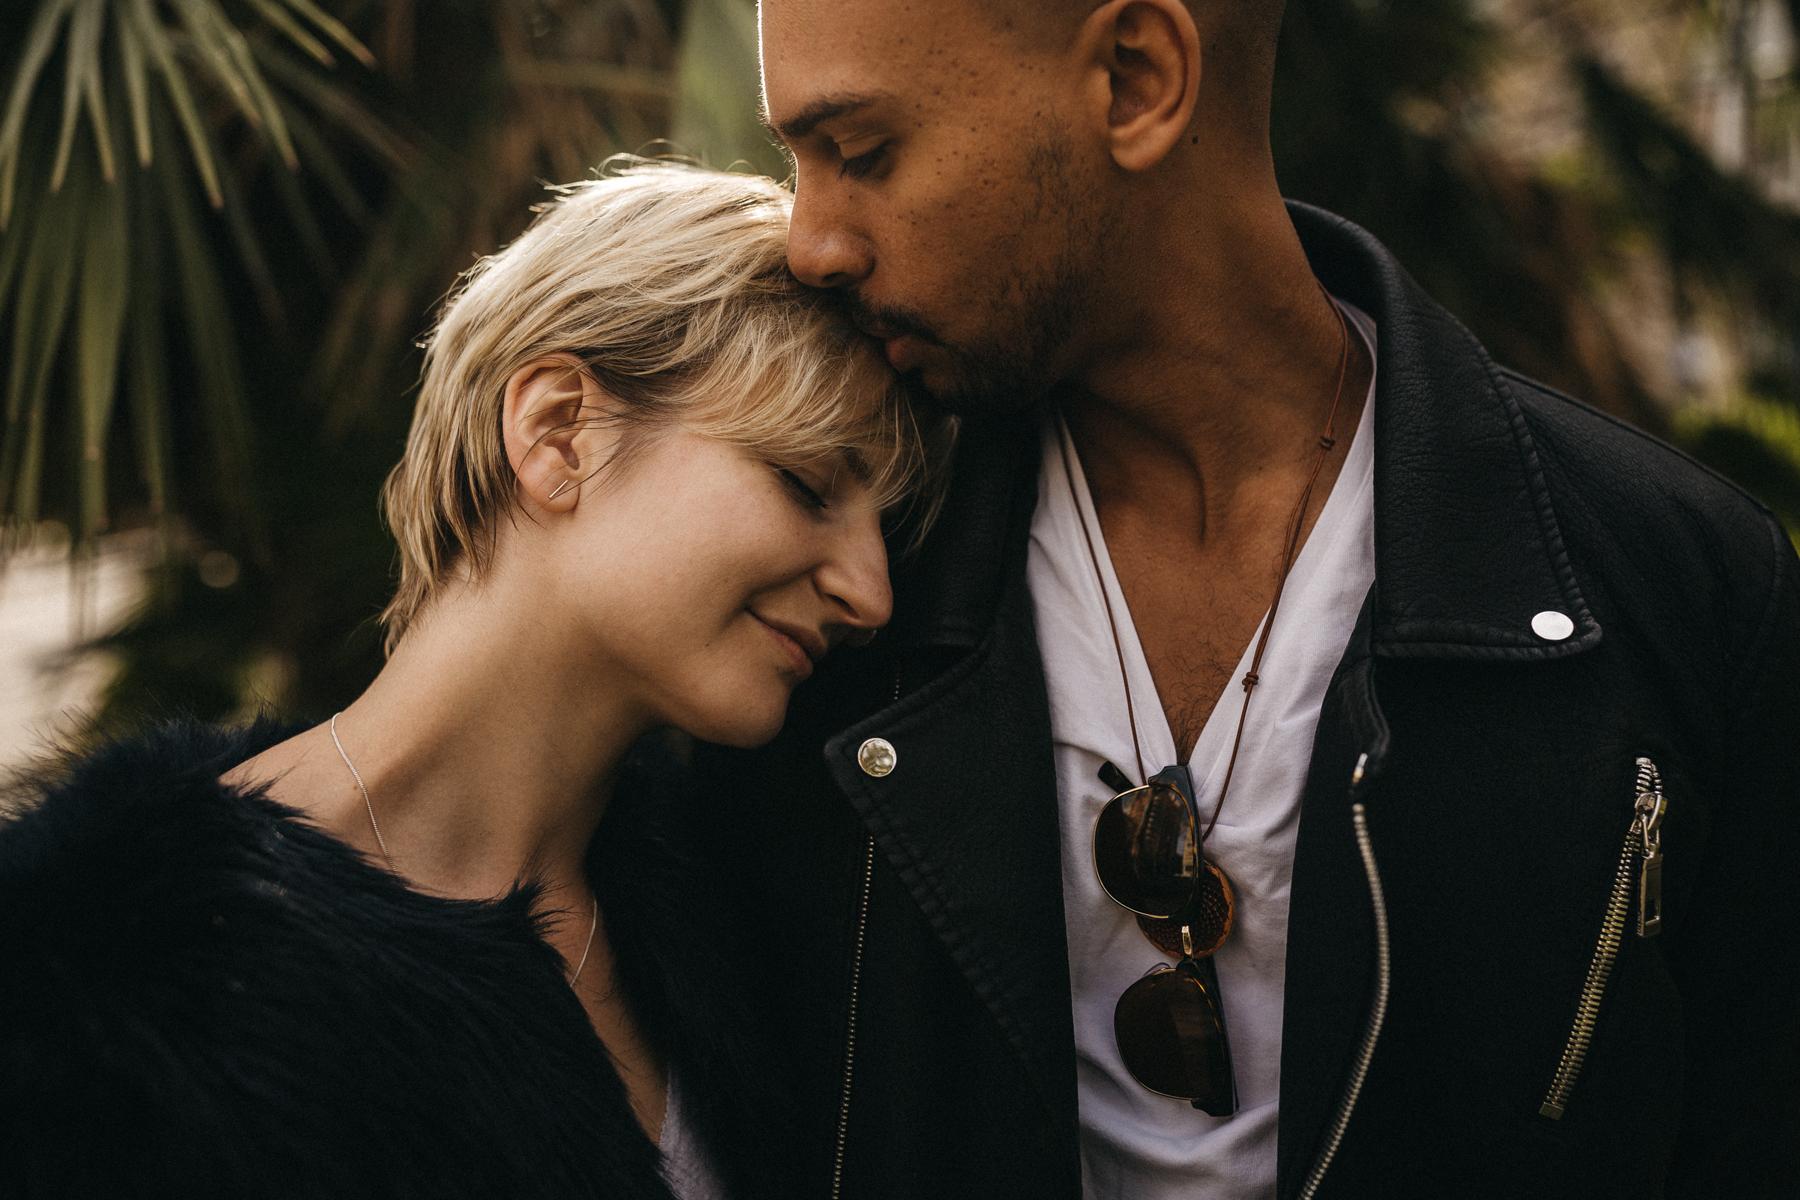 raissa simon fotografie urban coupleshooting barcelona 027 - Wietske + Stefanos